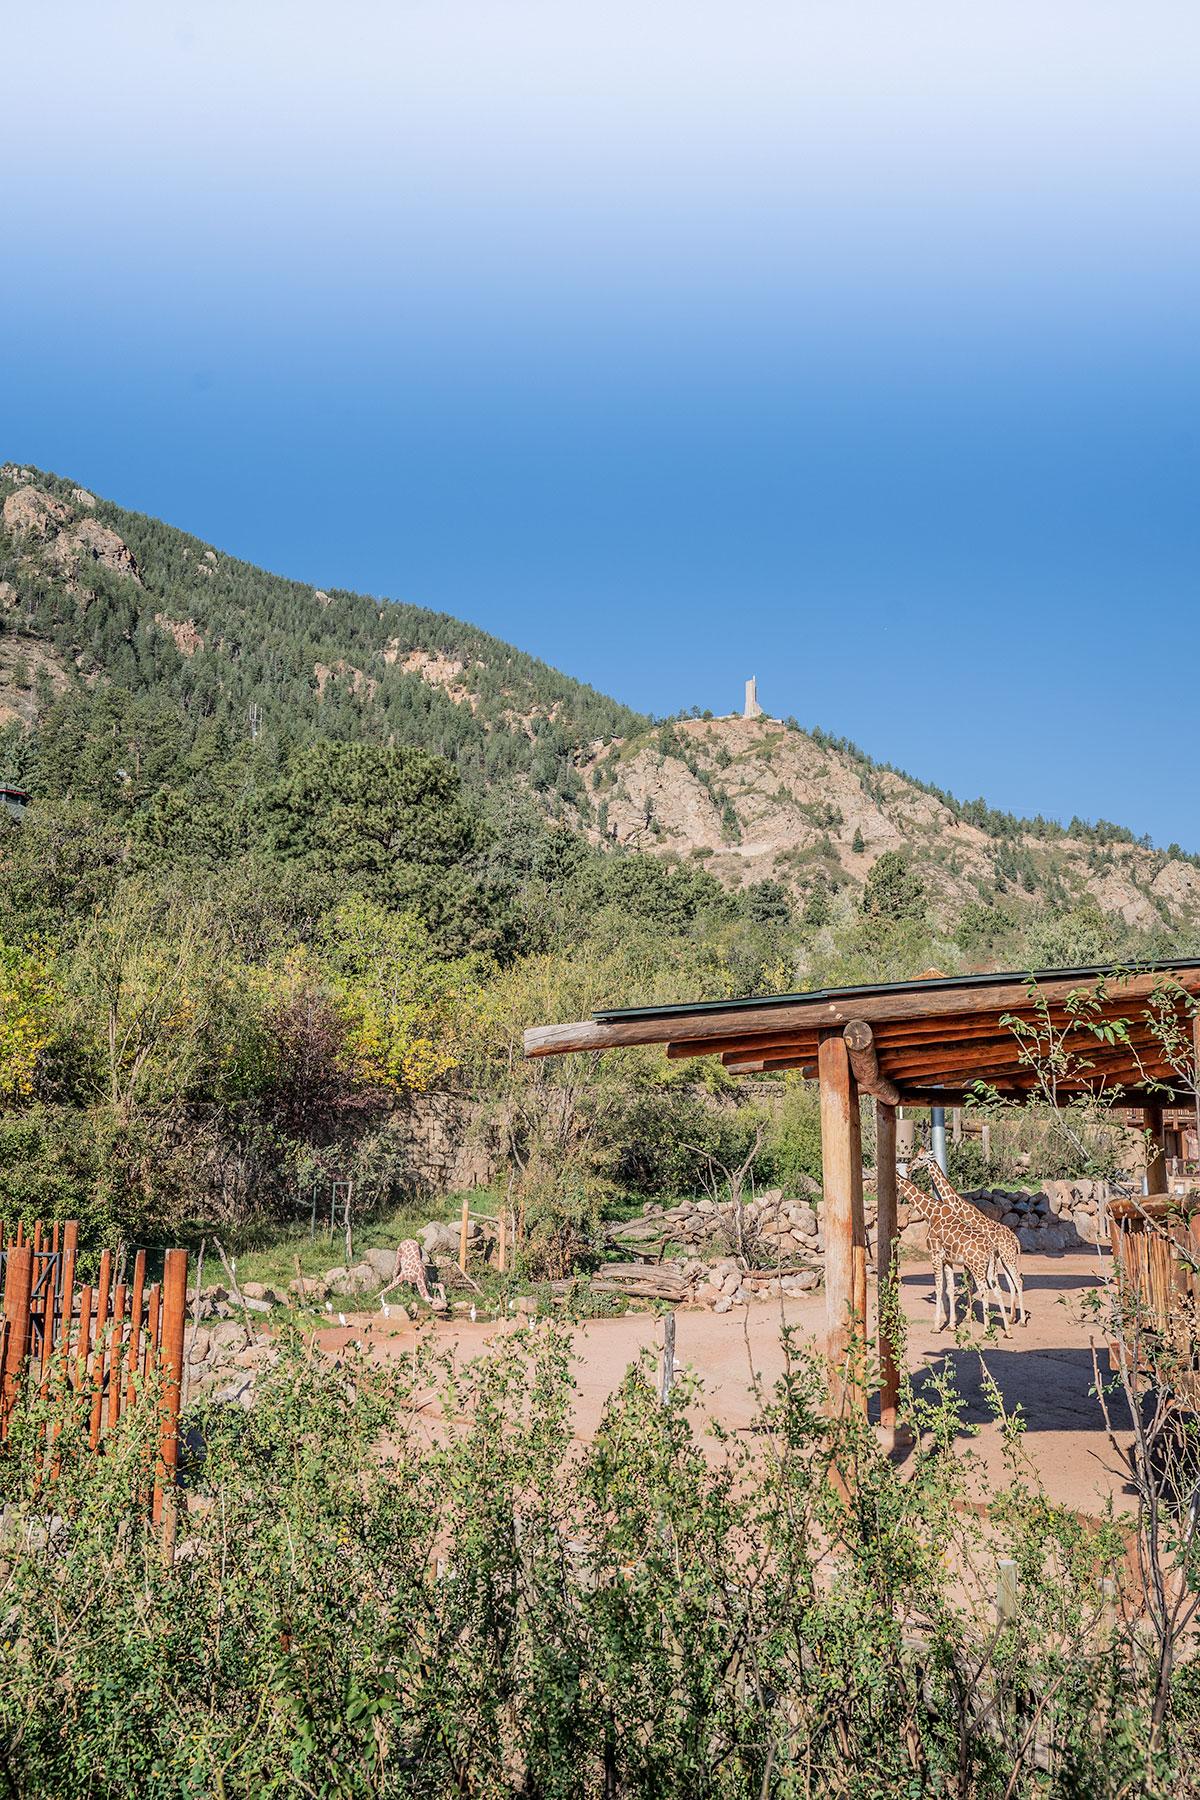 Cheyenne-Mountain-Zoo-Colorado-Springs-Giraffes